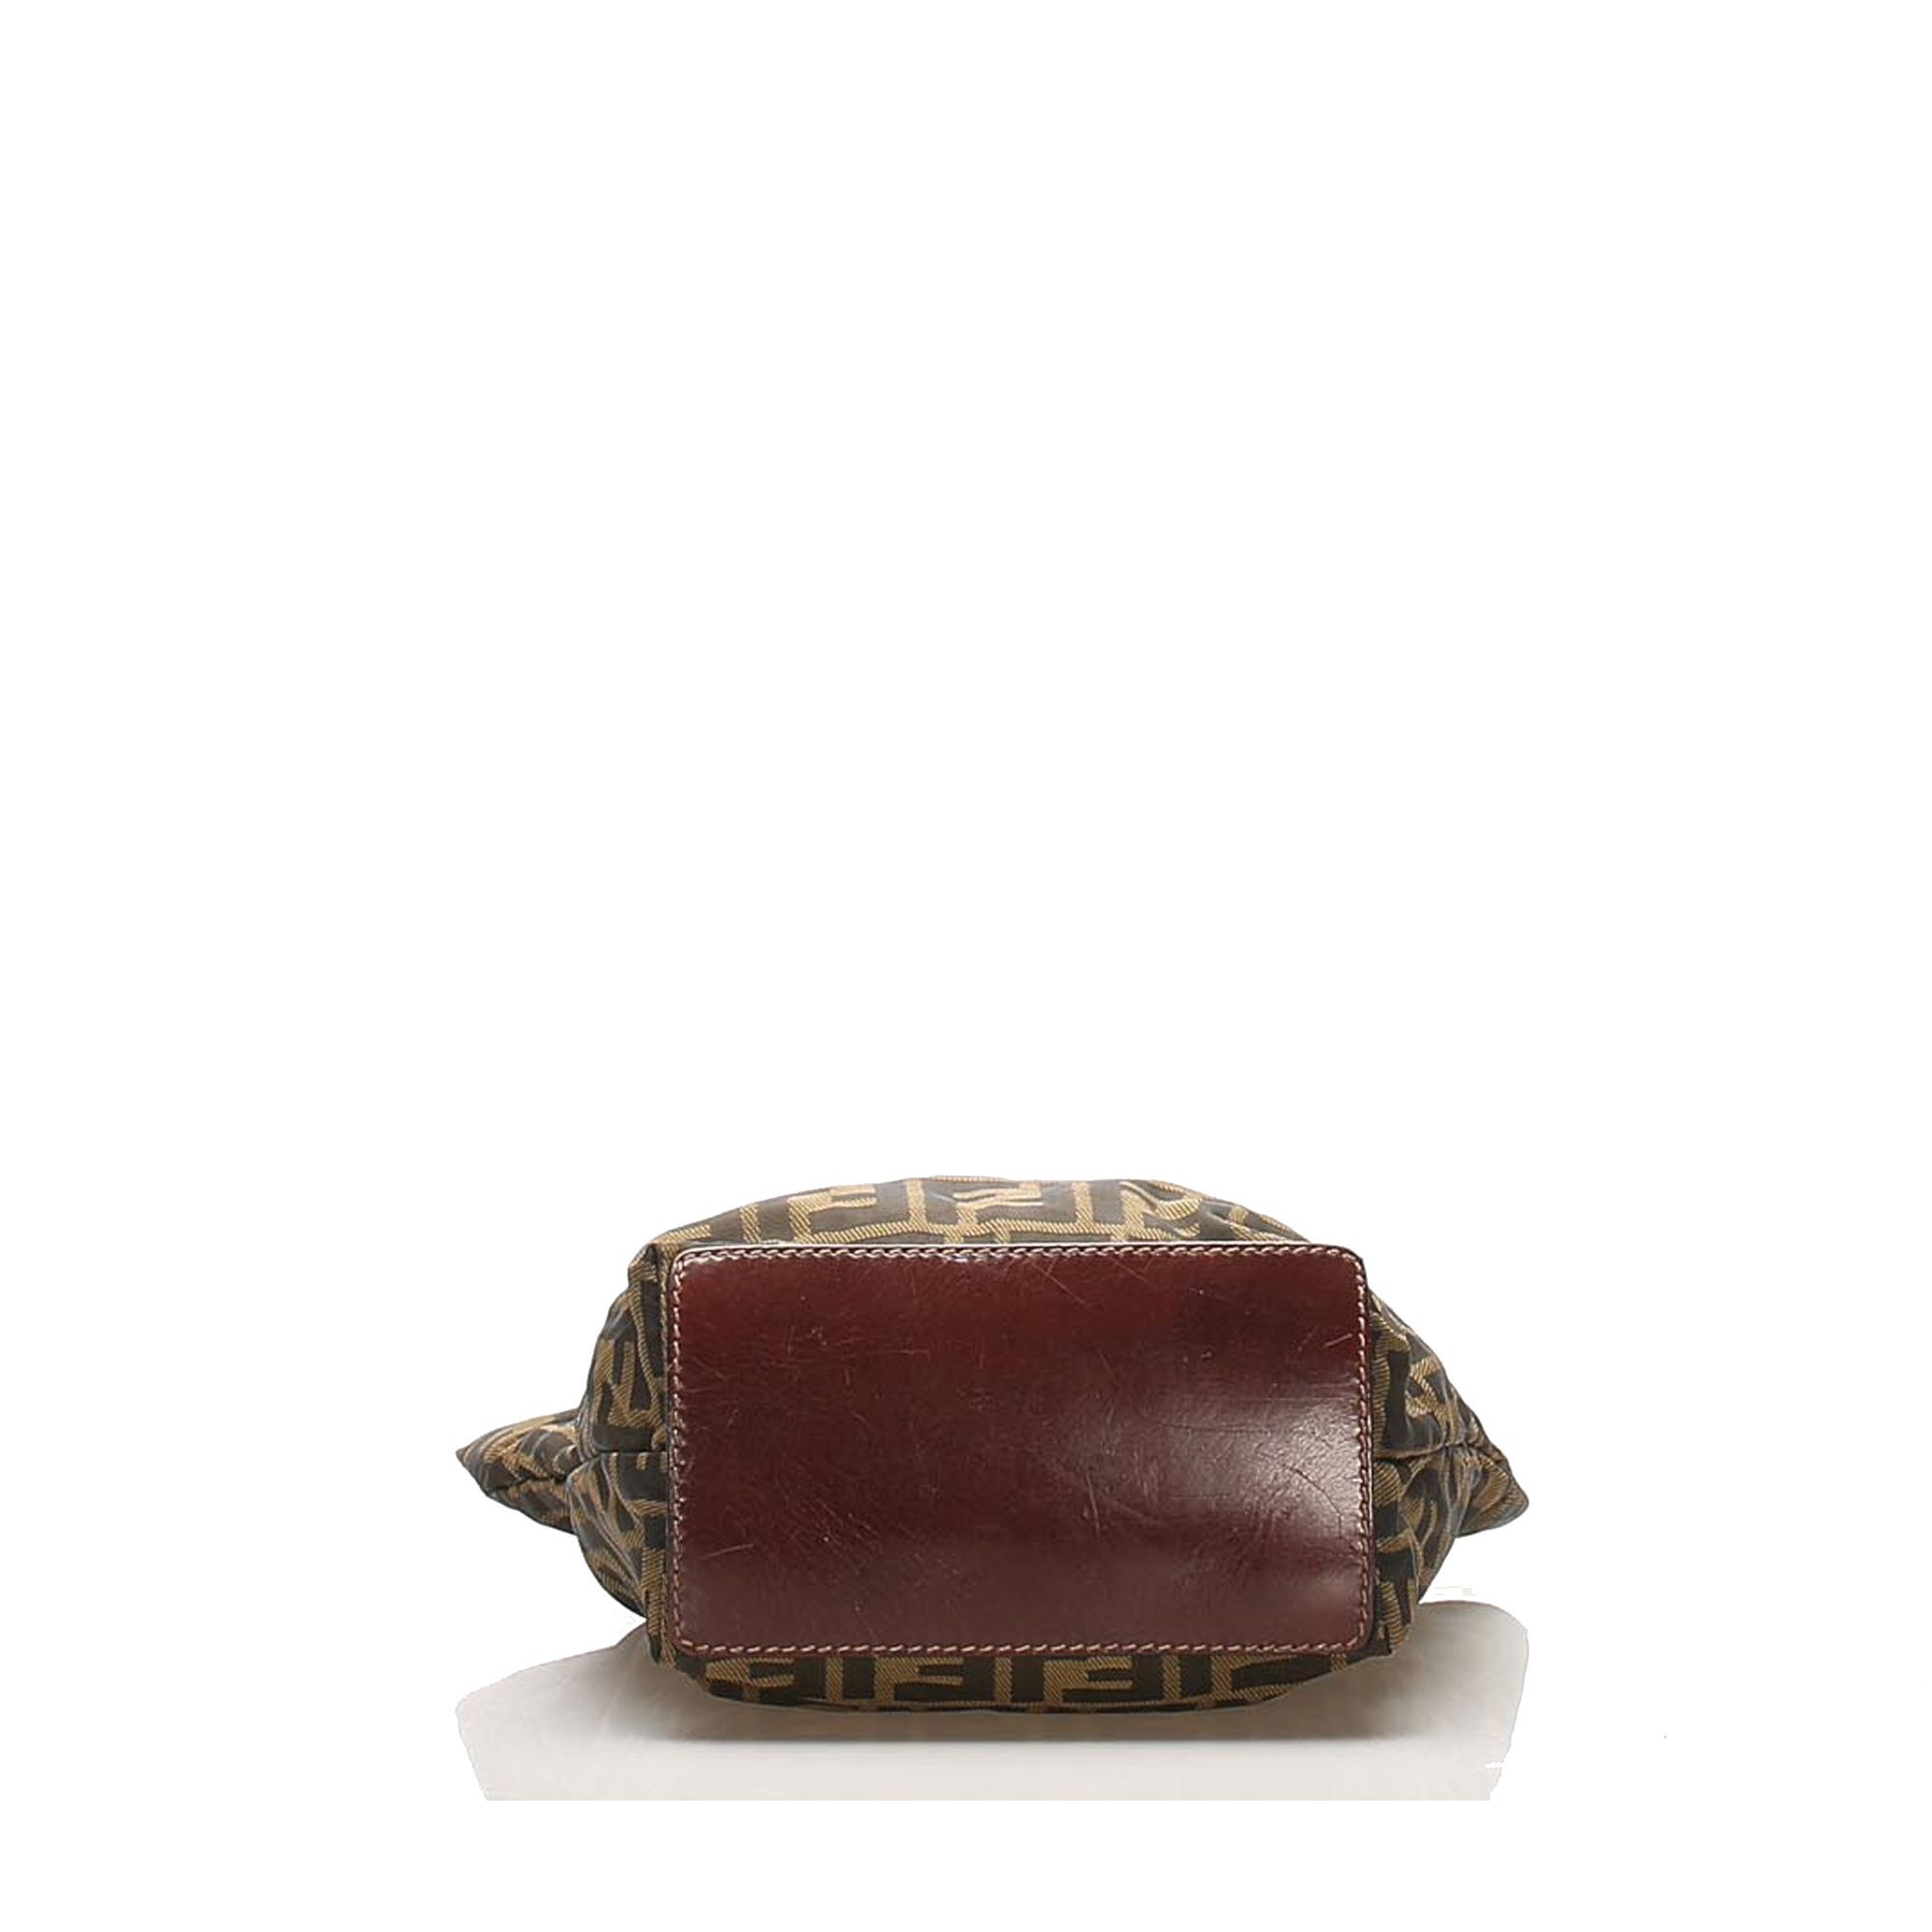 Vintage Fendi Zucca Canvas Tote Bag Brown